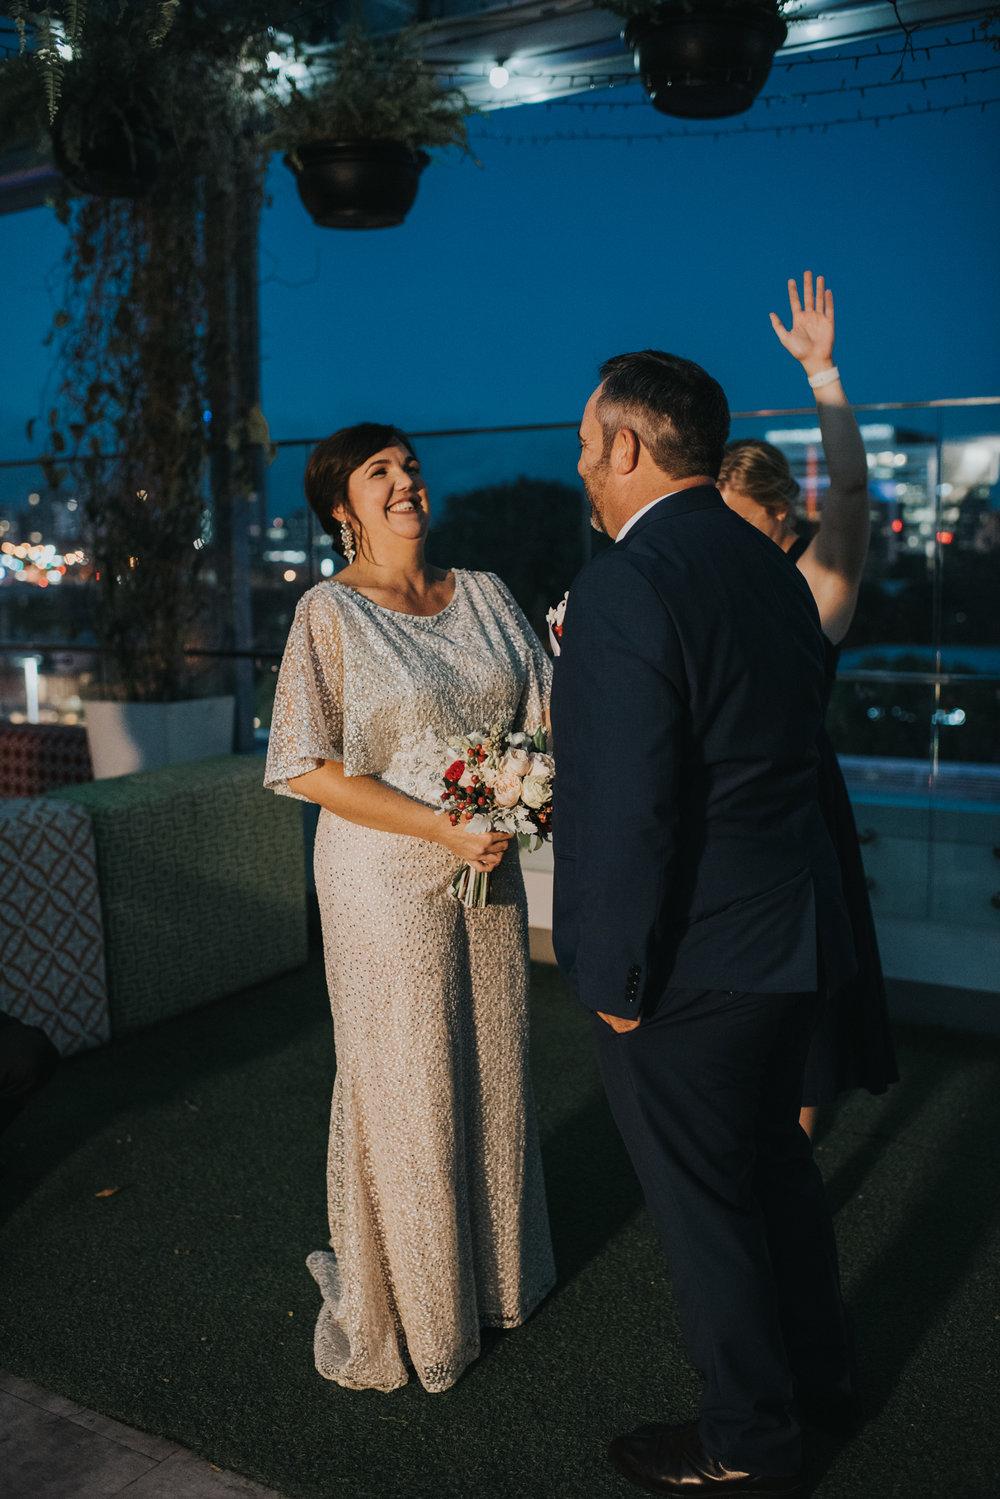 Brisbane Engagement Photographer | Wedding-Elopement Photography-65.jpg